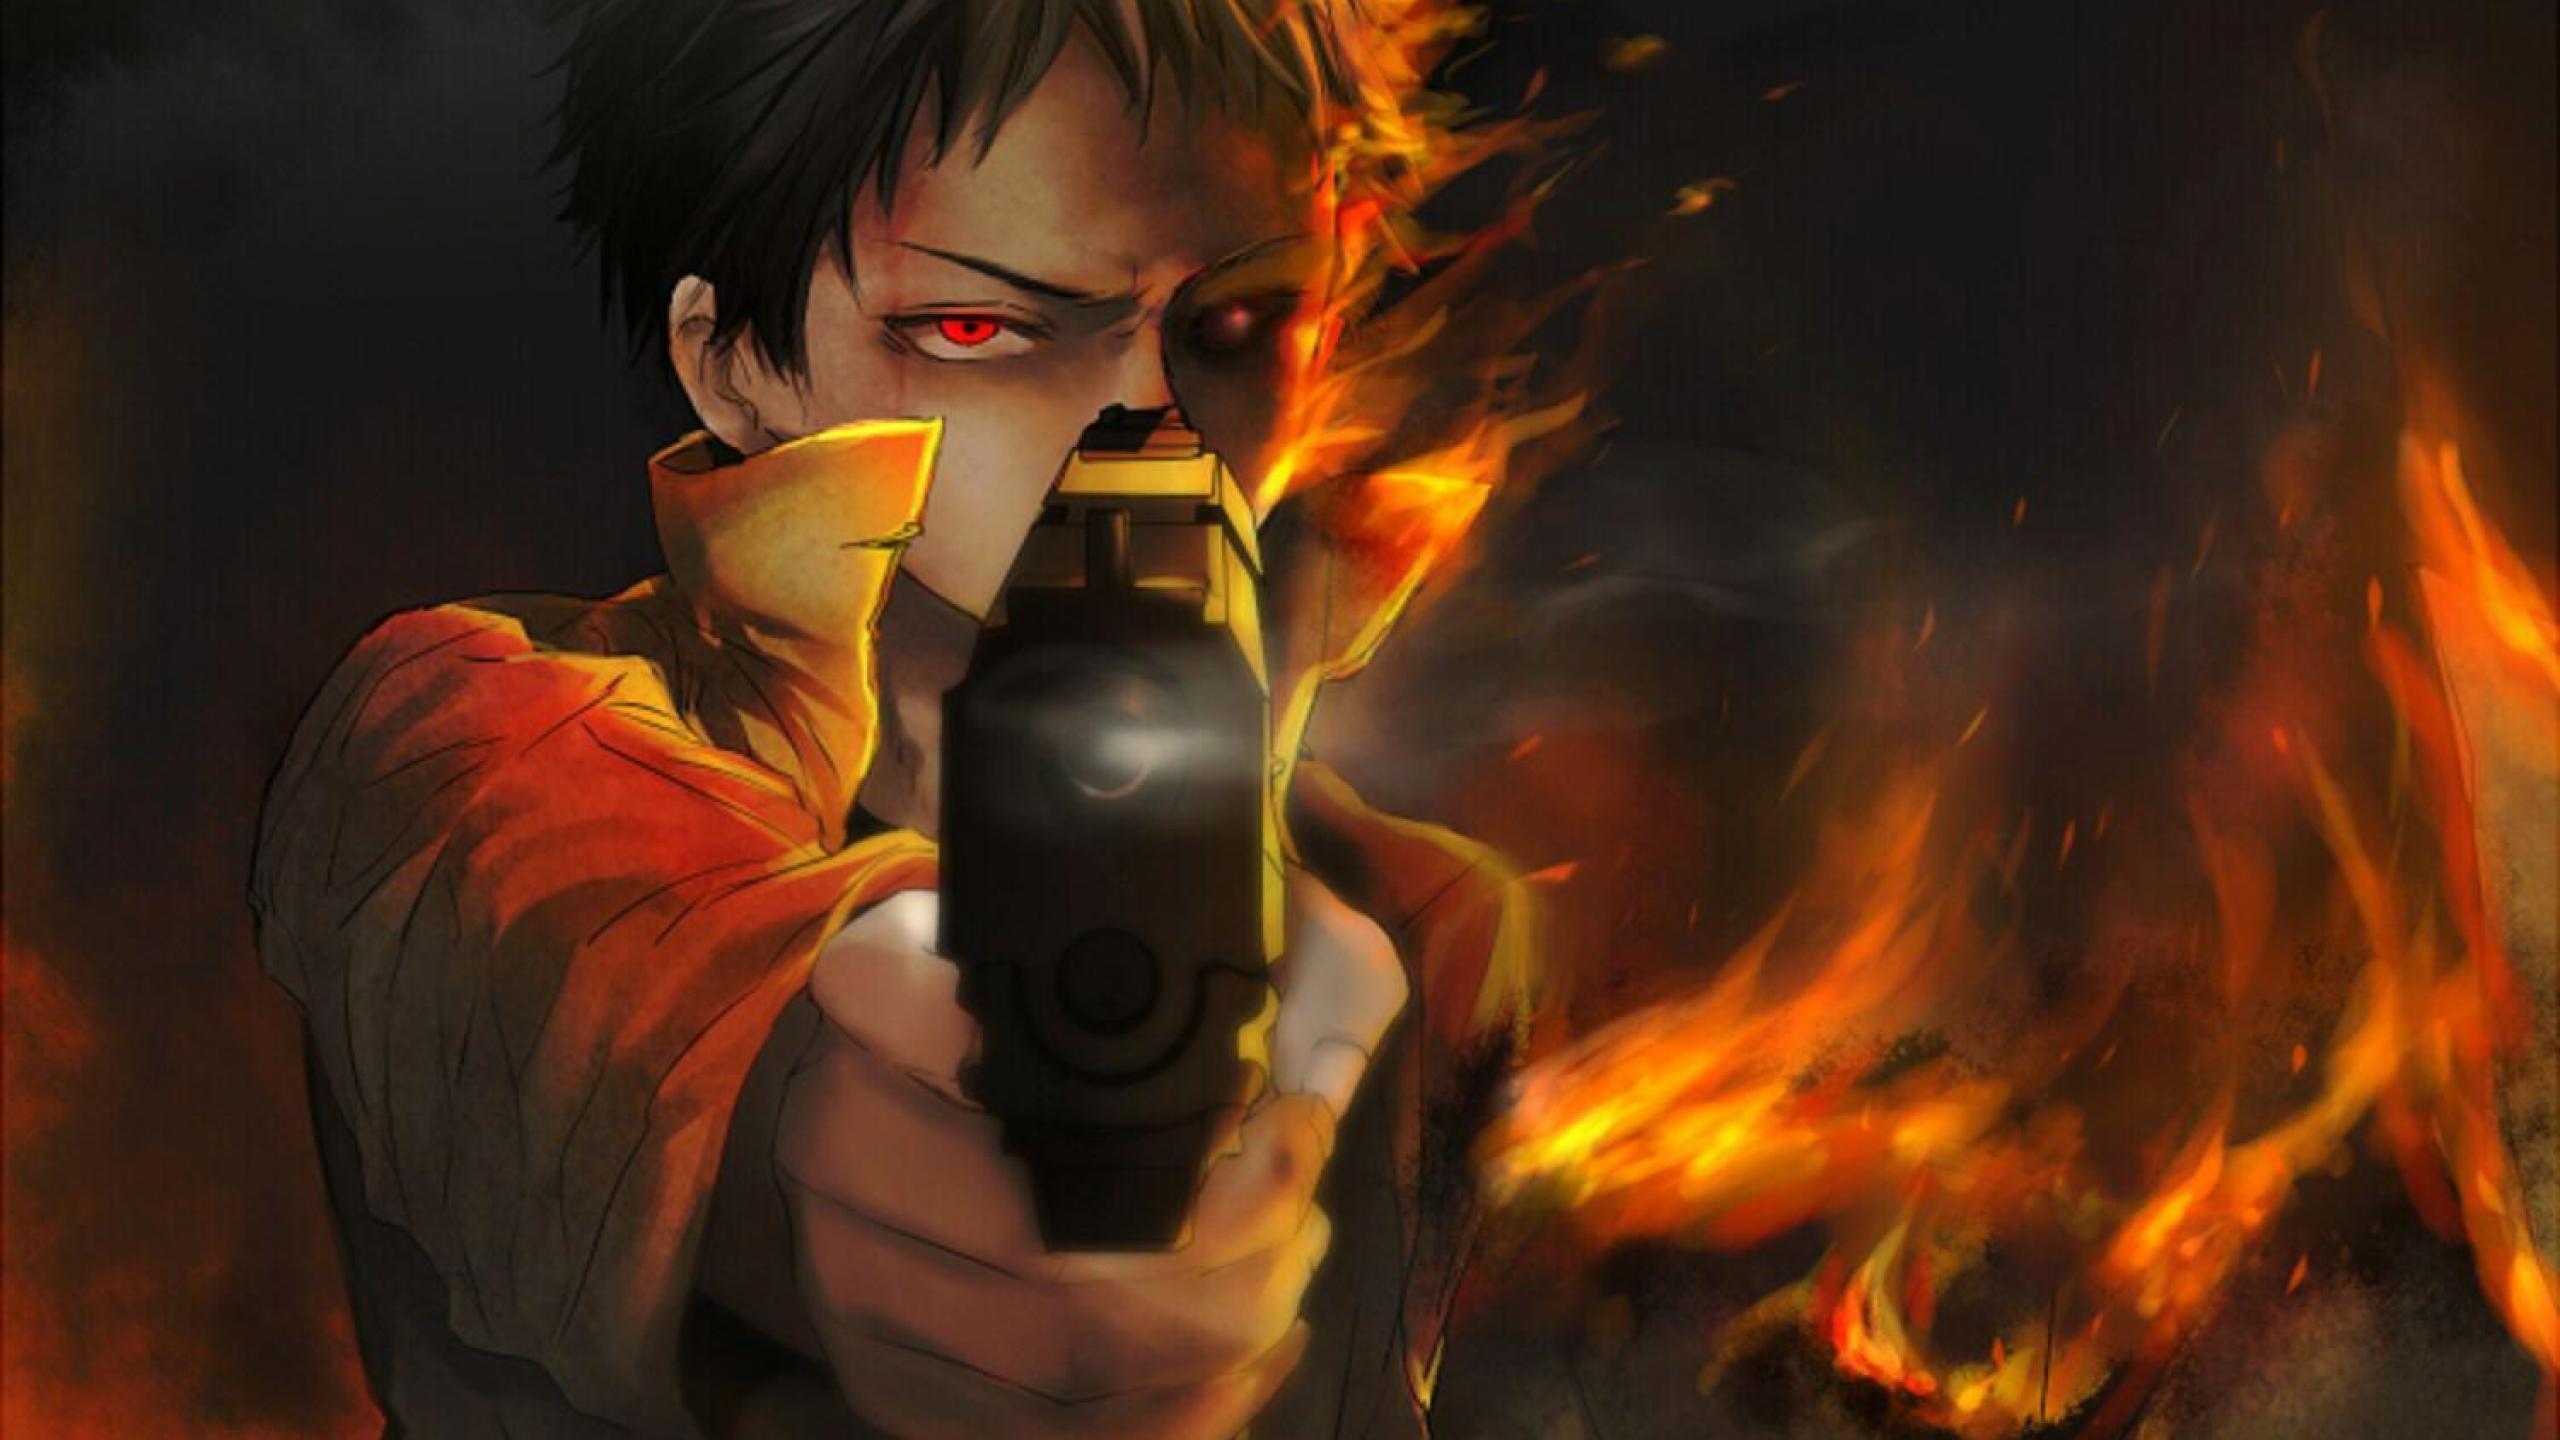 Anime 2560x1440 One-Punch Man zombie man anime